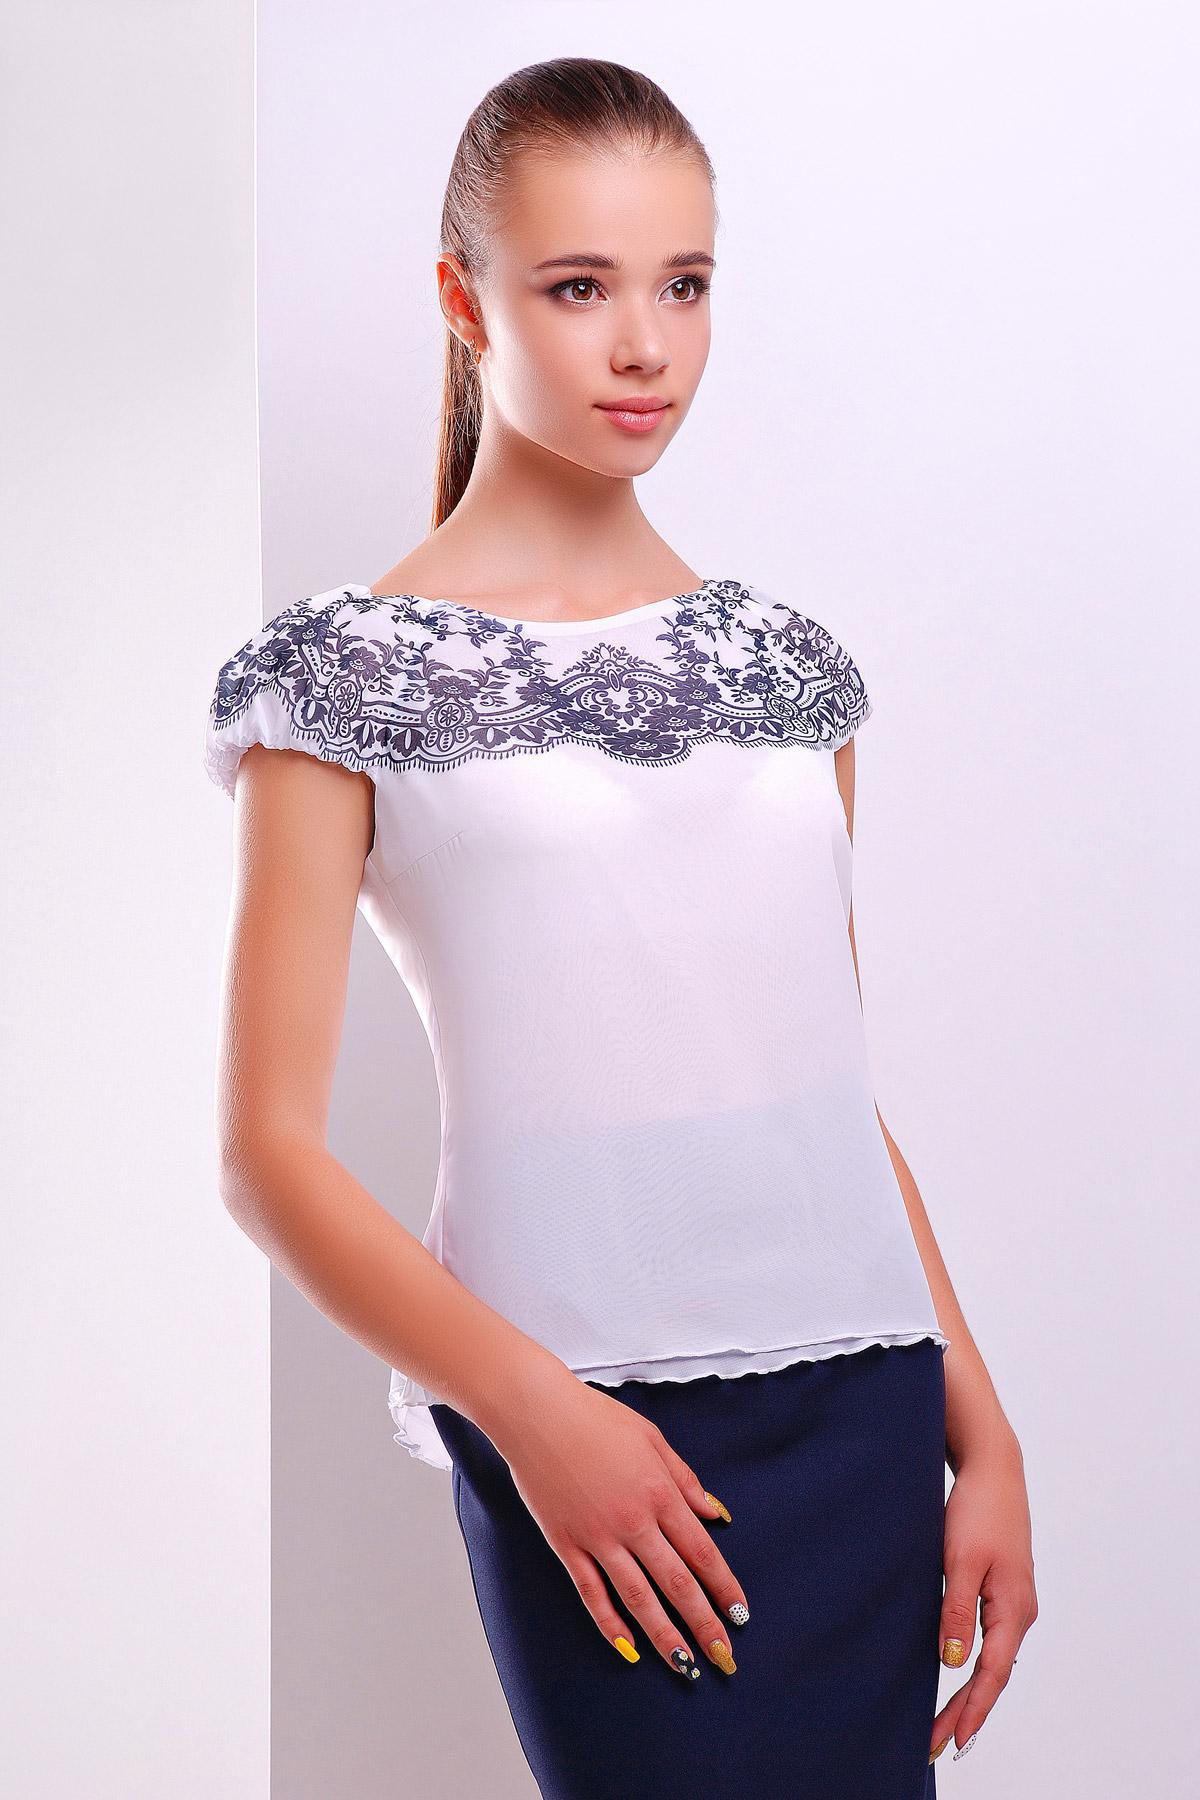 0d37c9806a5 белая блузка из шифона с коротким рукавом. Узор темно синий блуза Жулли2 б р